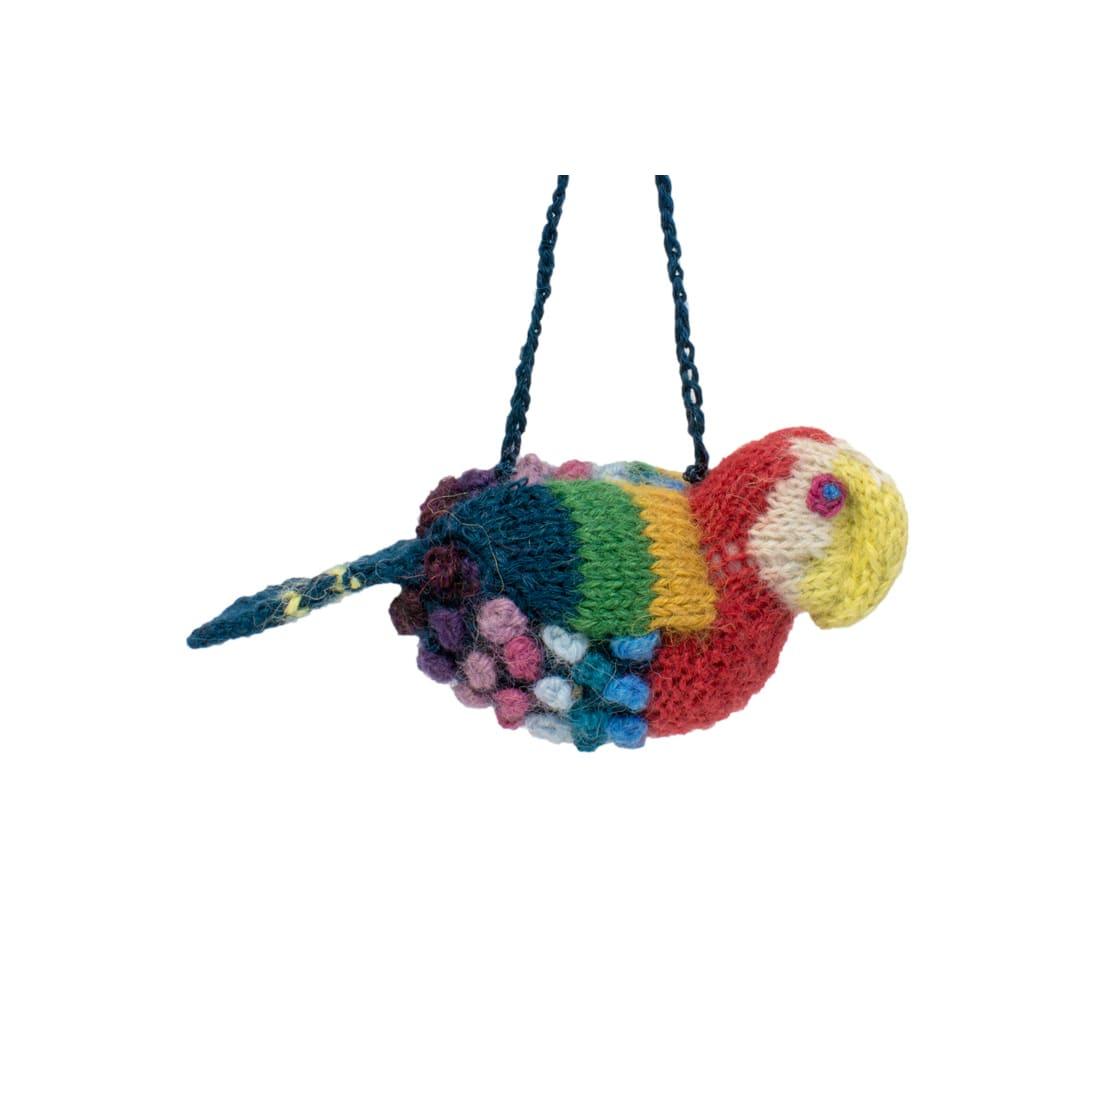 CRK072A Macaw